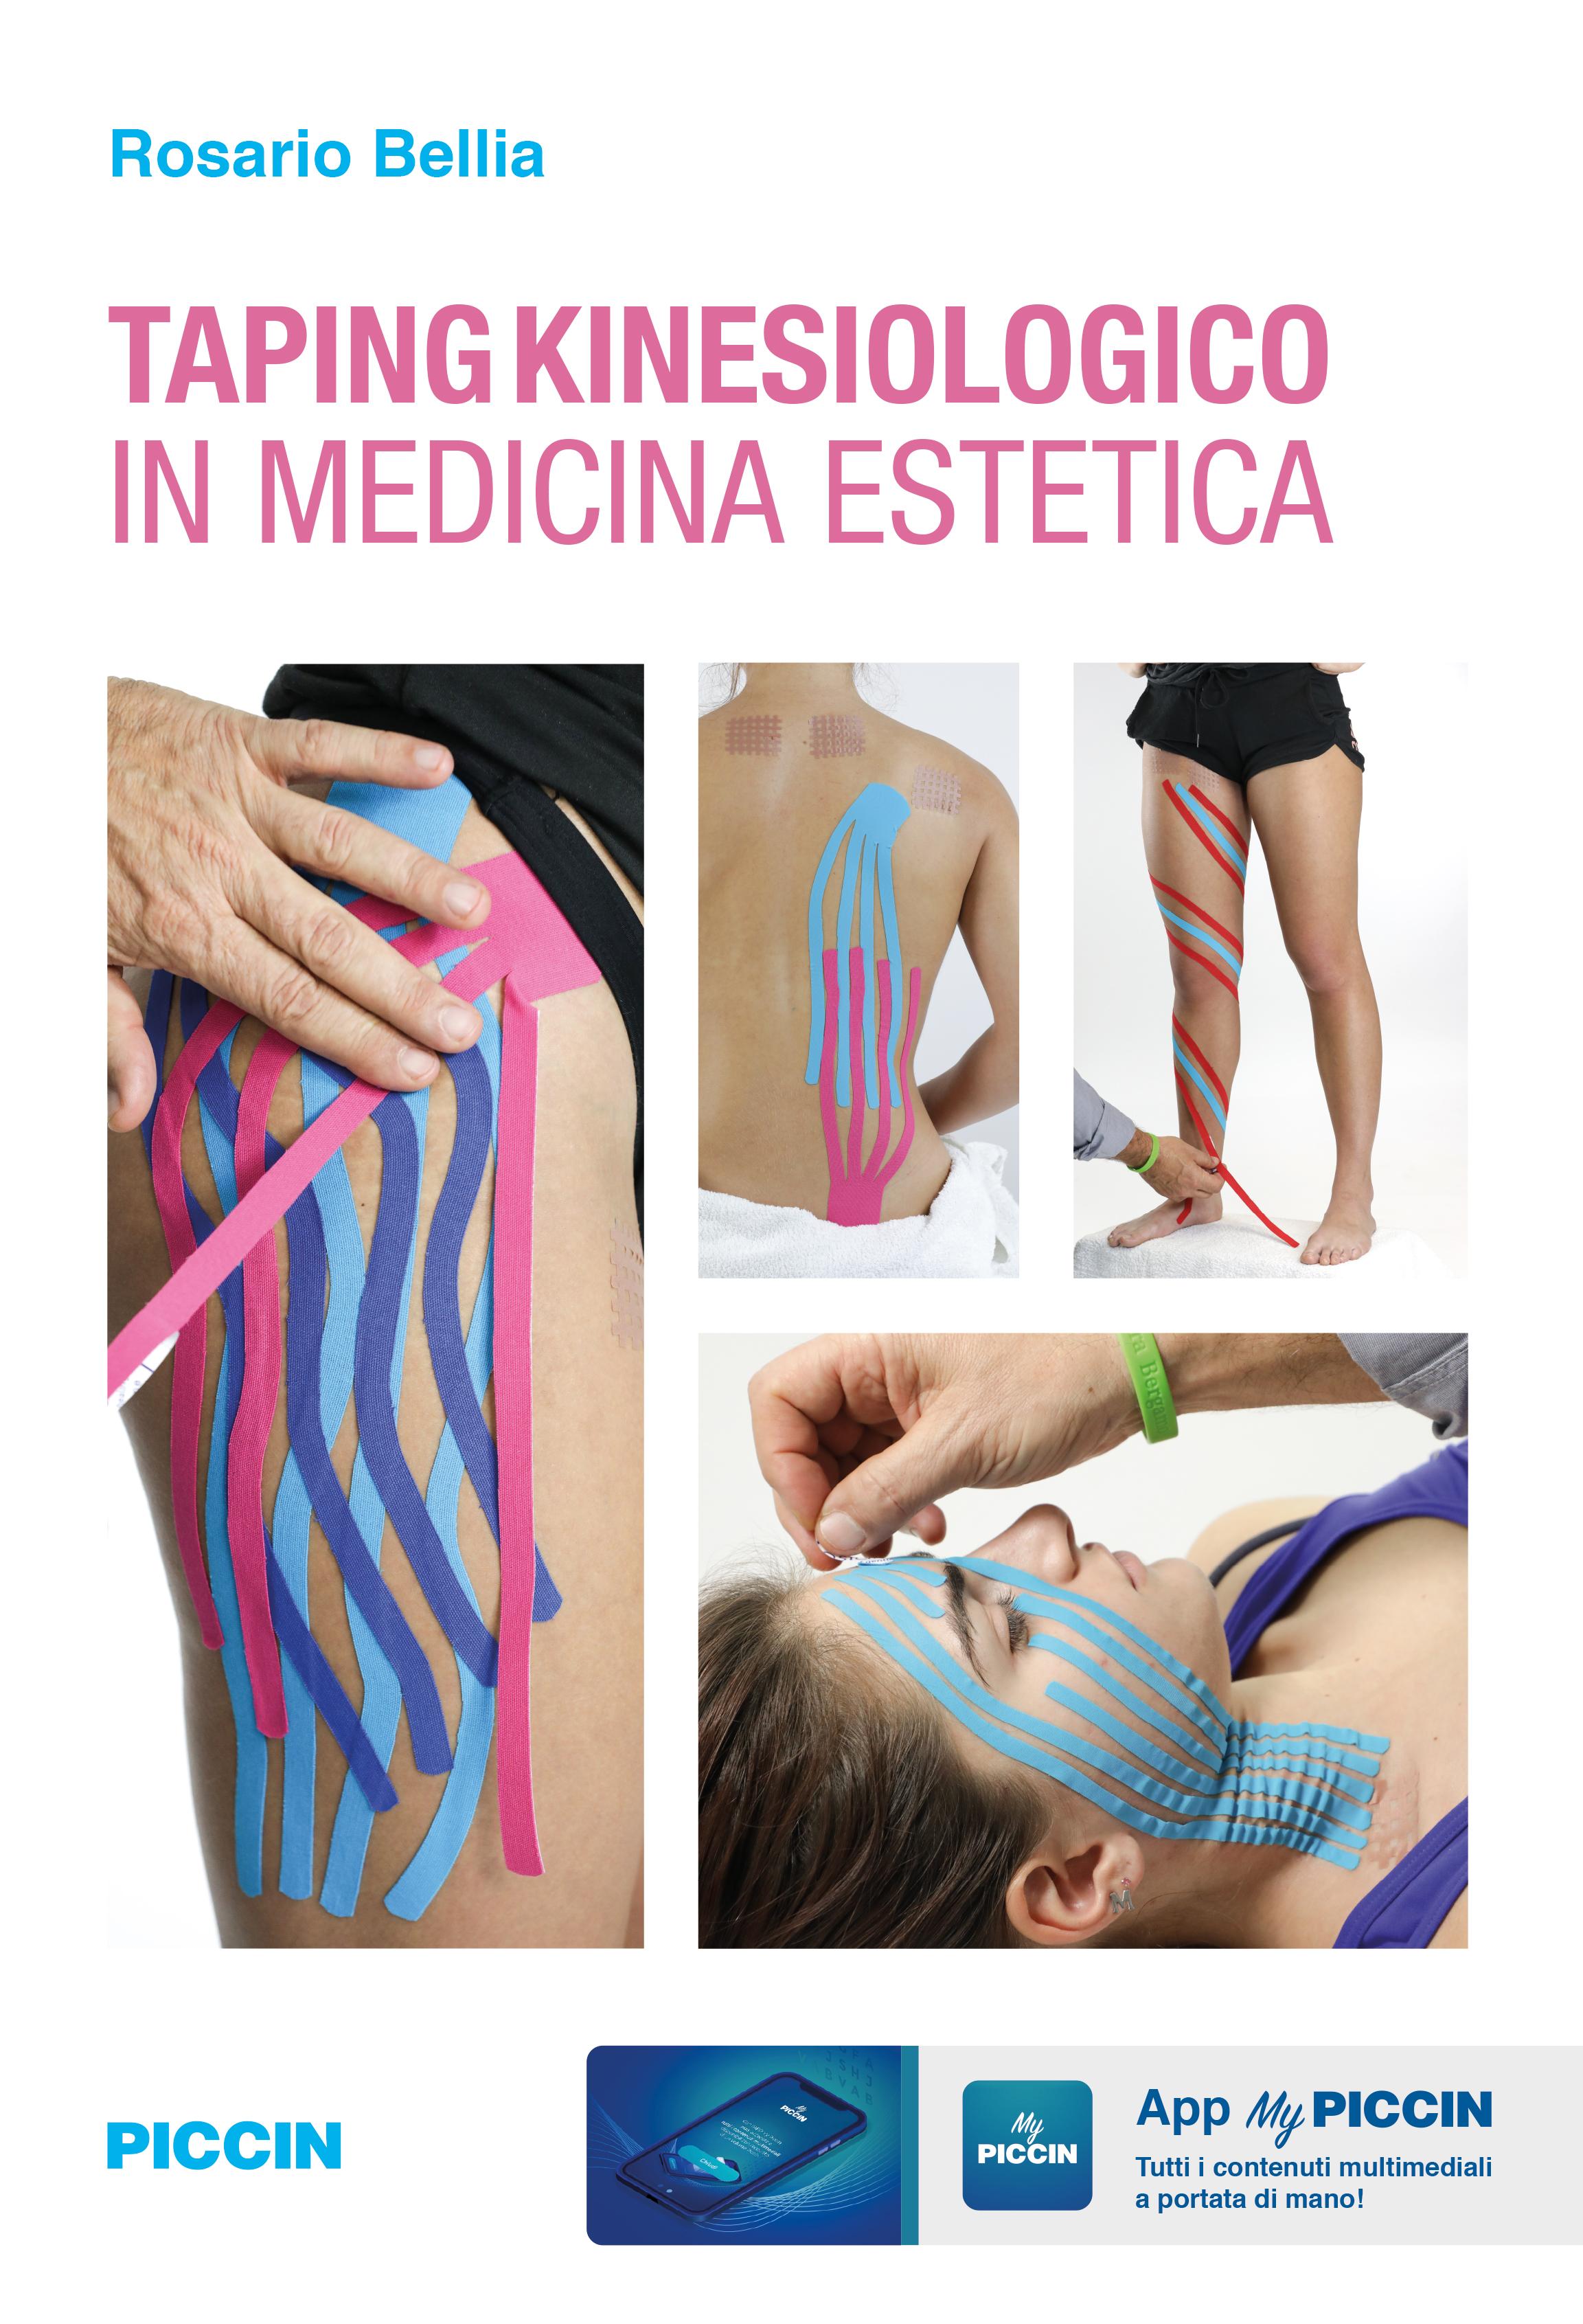 Taping kinesiologico in medicina estetica (002)